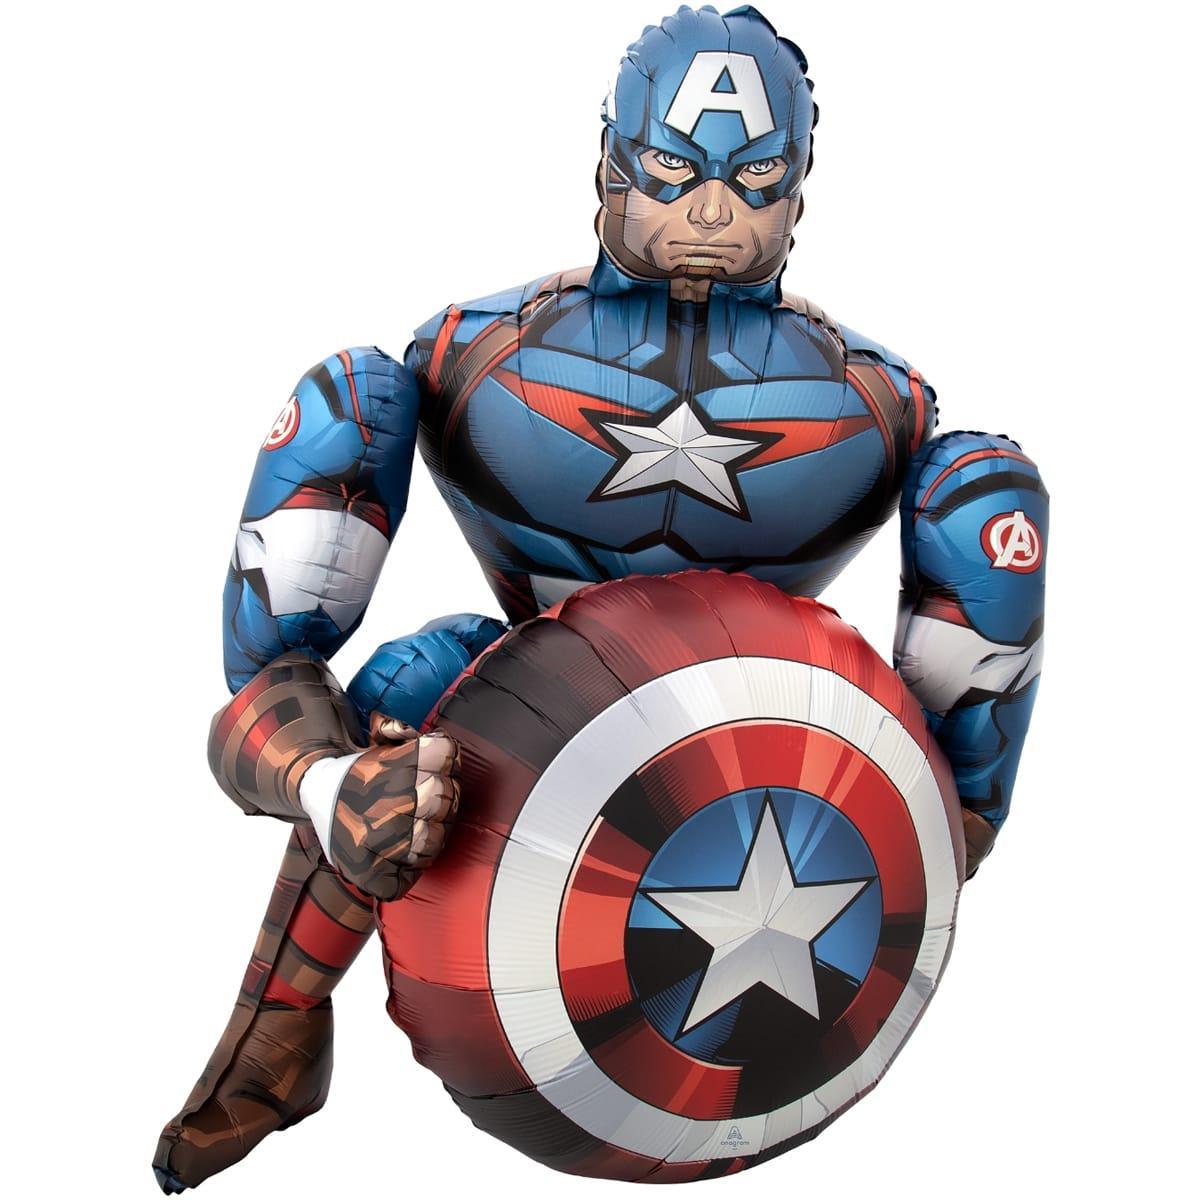 Ходяча Фігура Капітан Америка